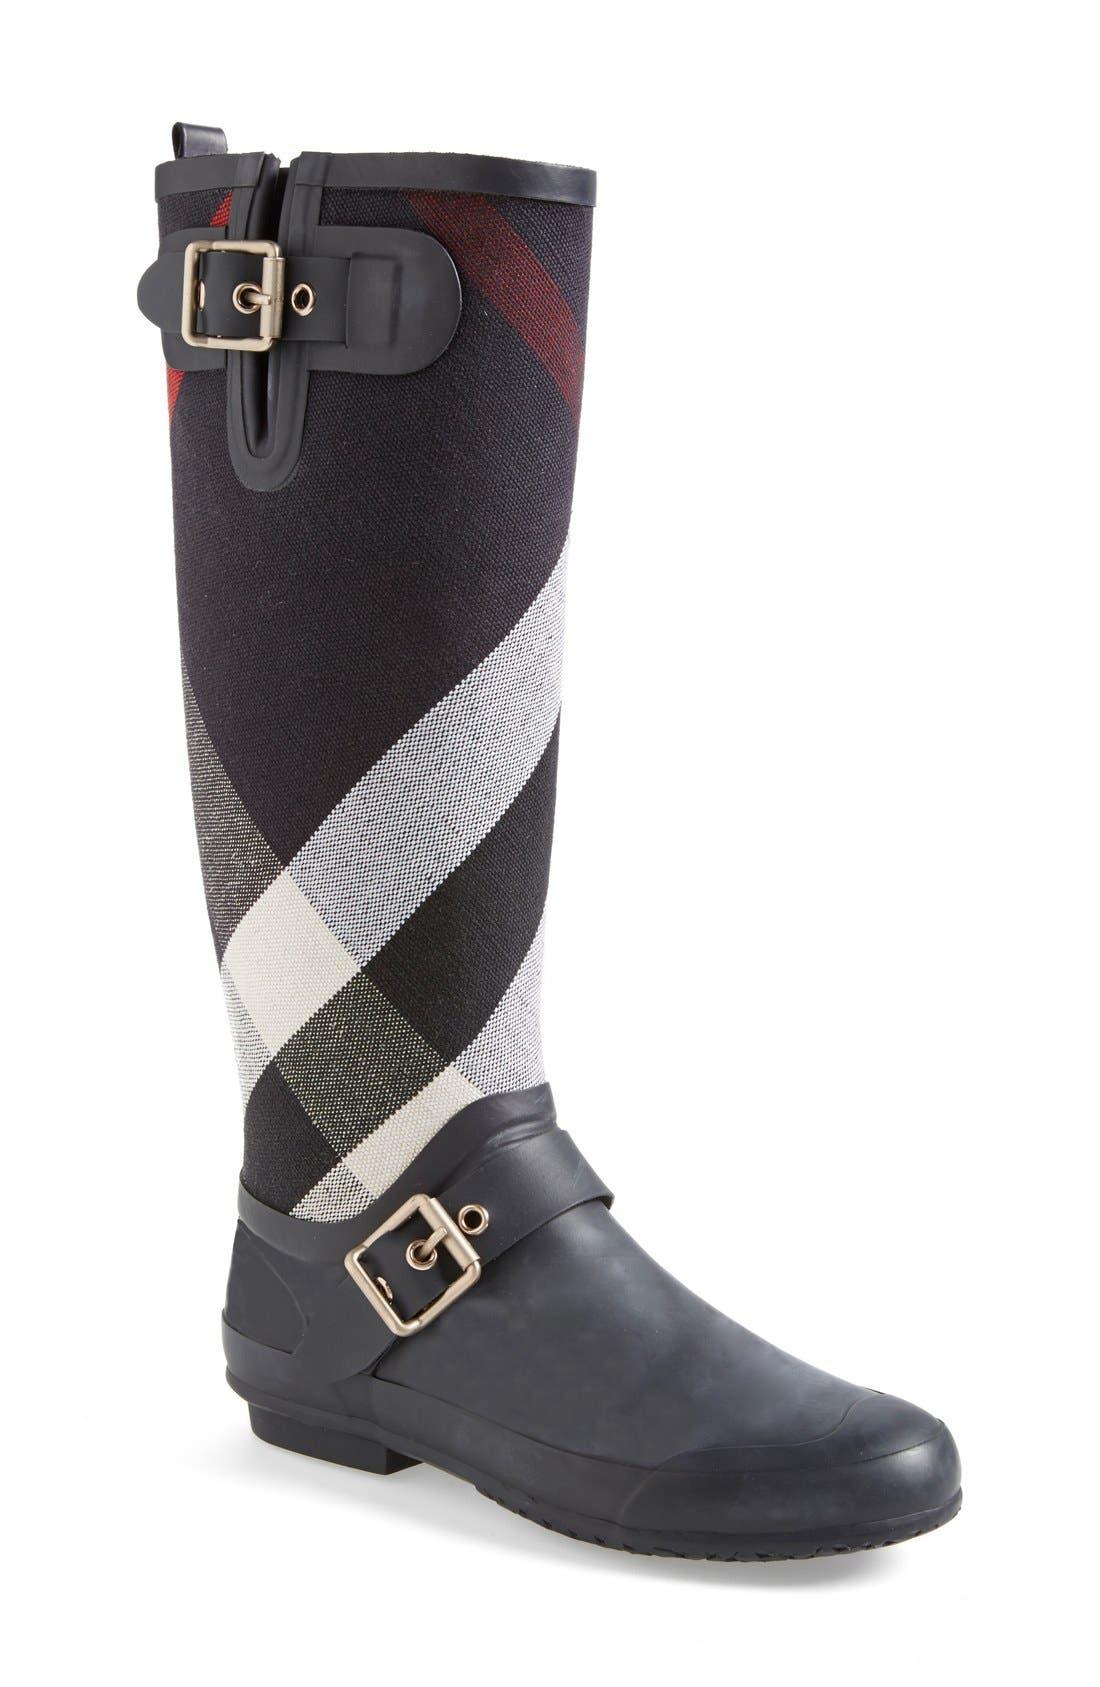 Main Image - Burberry 'Birkback' Rain Boot (Women) (Wide Calf)